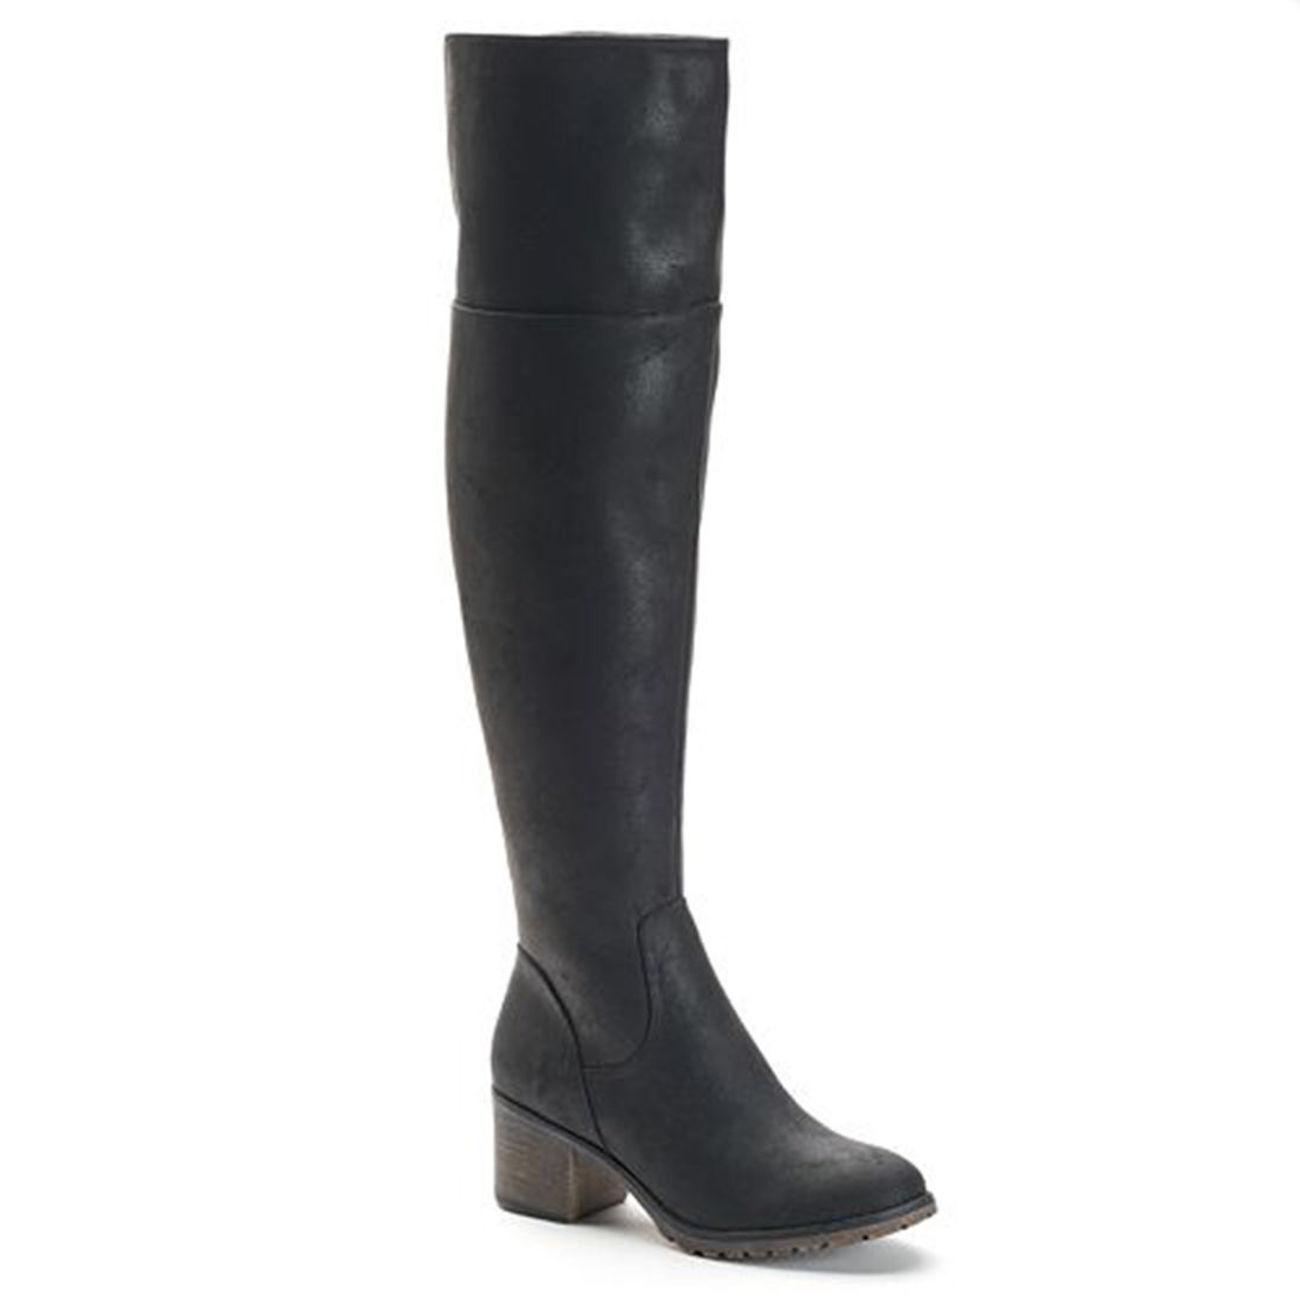 NEW SO Women Size 6-10 $90 Boots Thigh High Over The Knee Platform Black Zipper